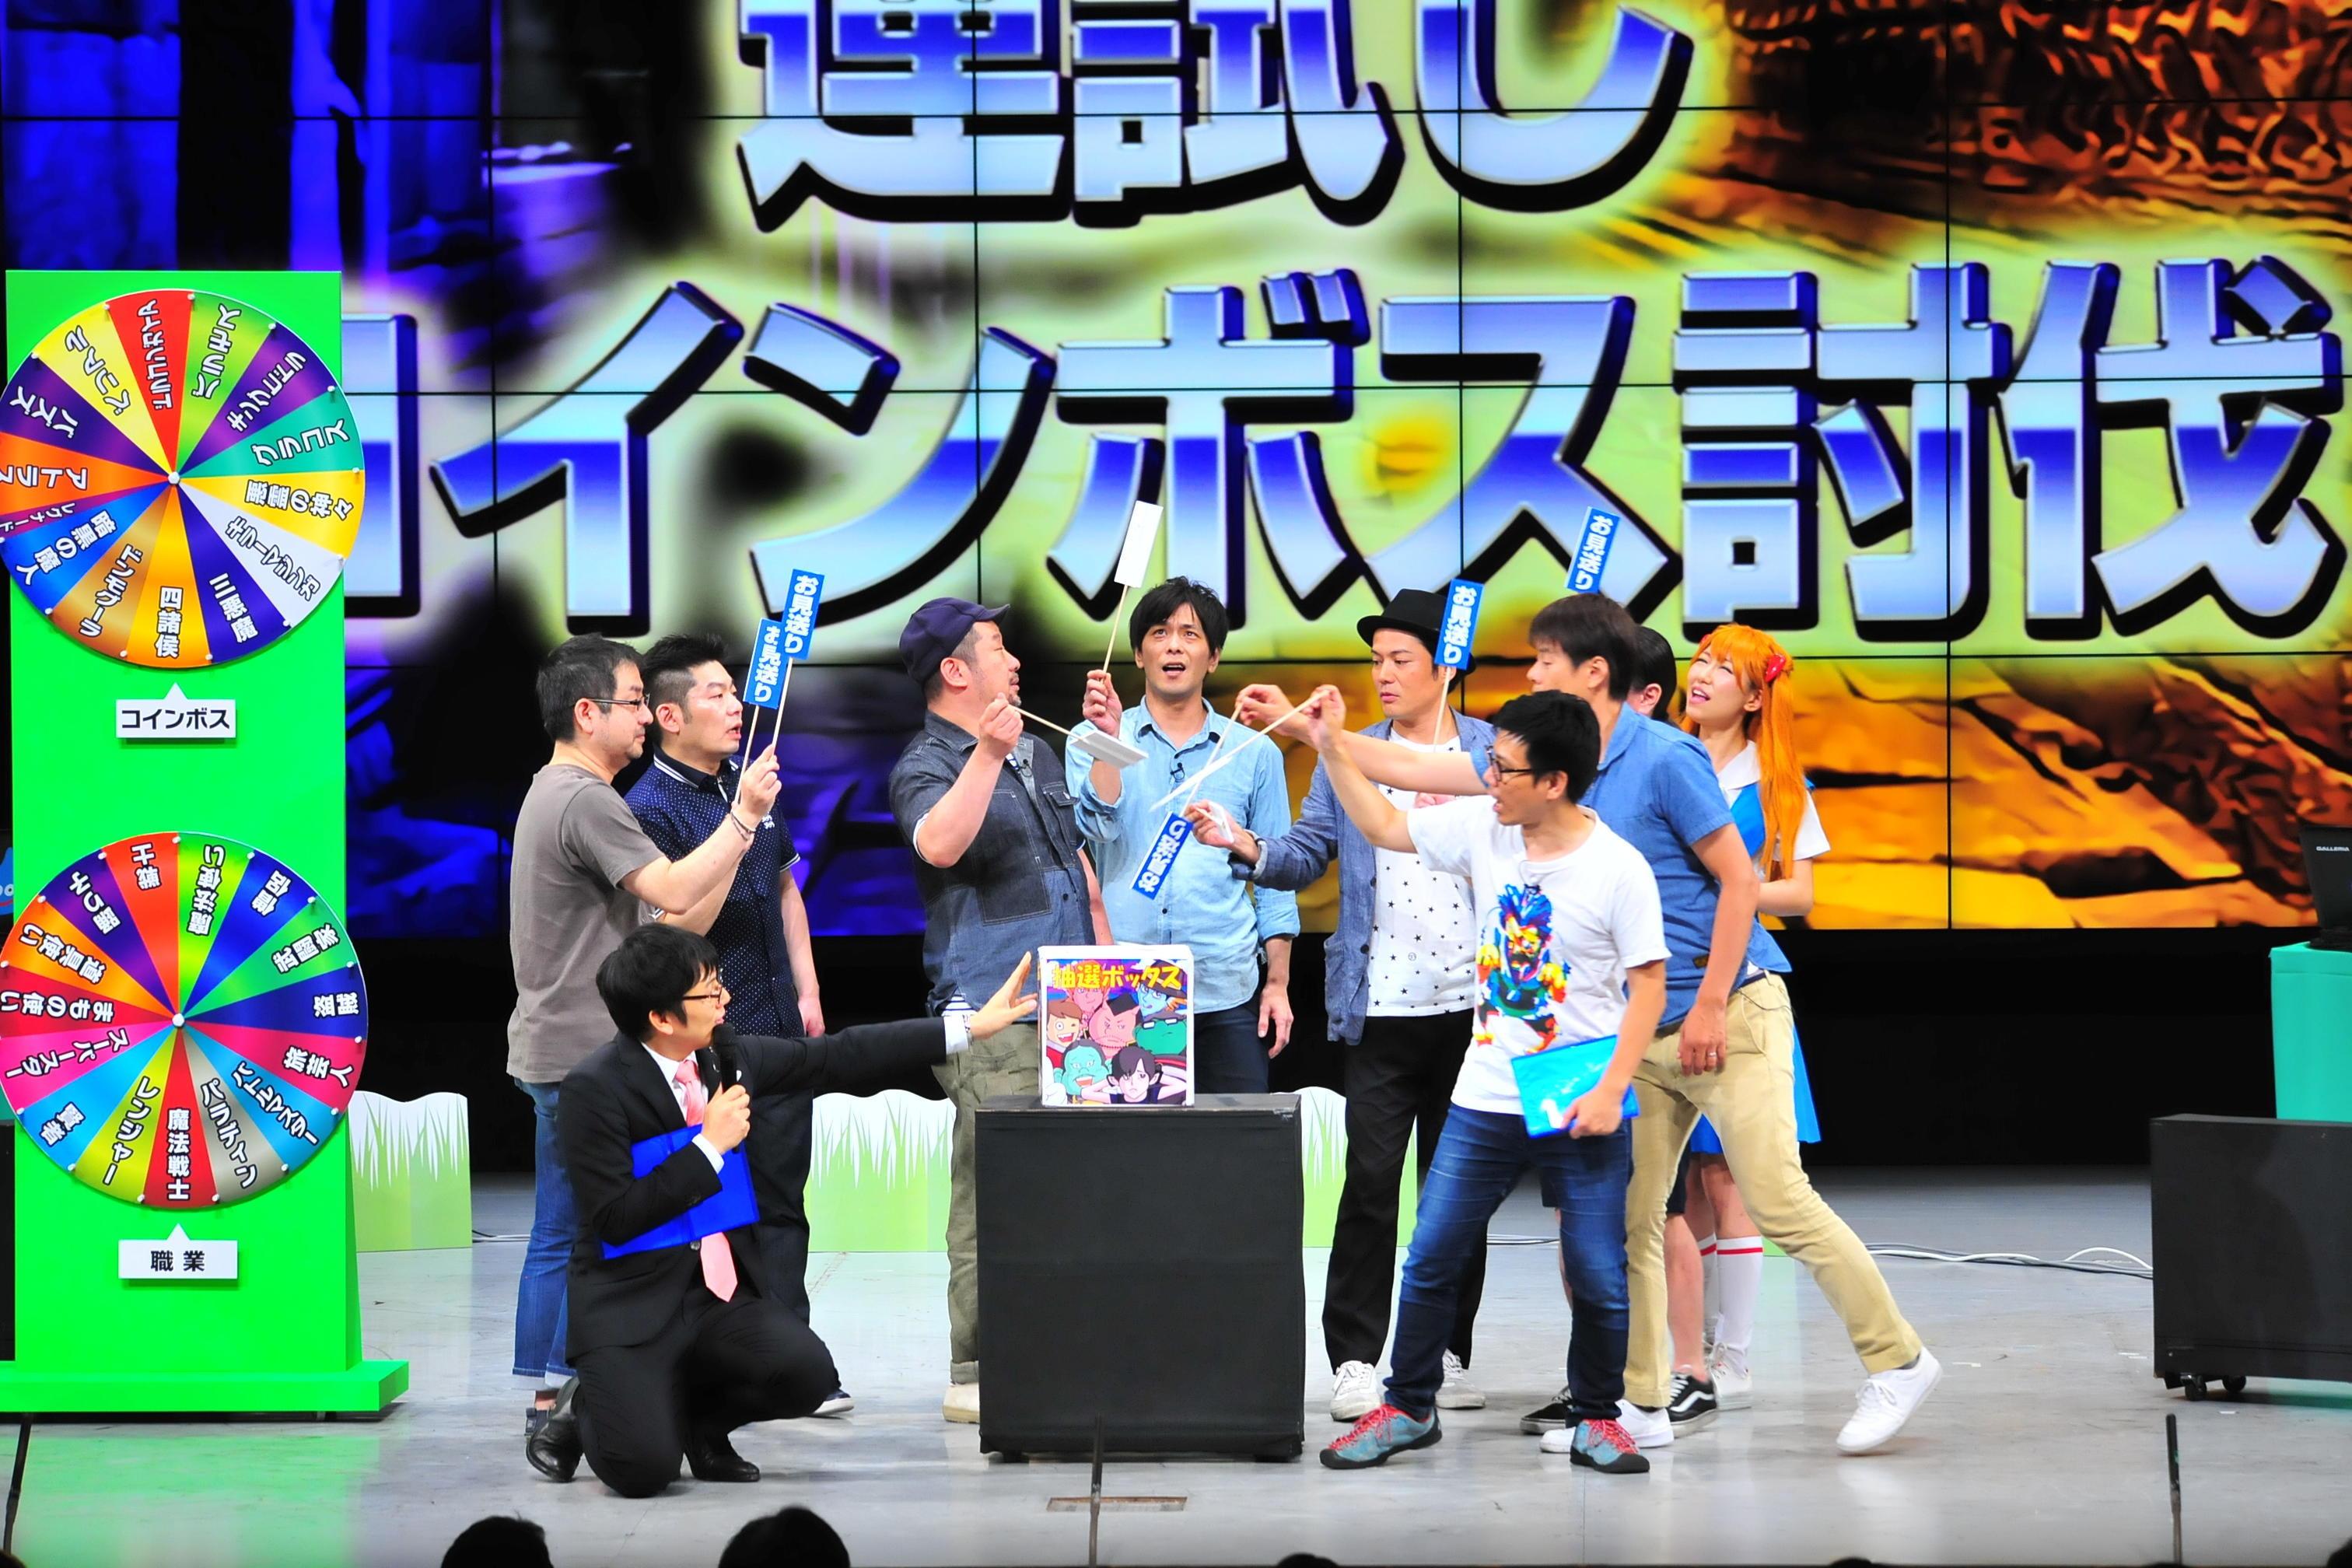 http://news.yoshimoto.co.jp/20160613095101-488e832562aedcf15ef221ee2ca78239feb67f87.jpg